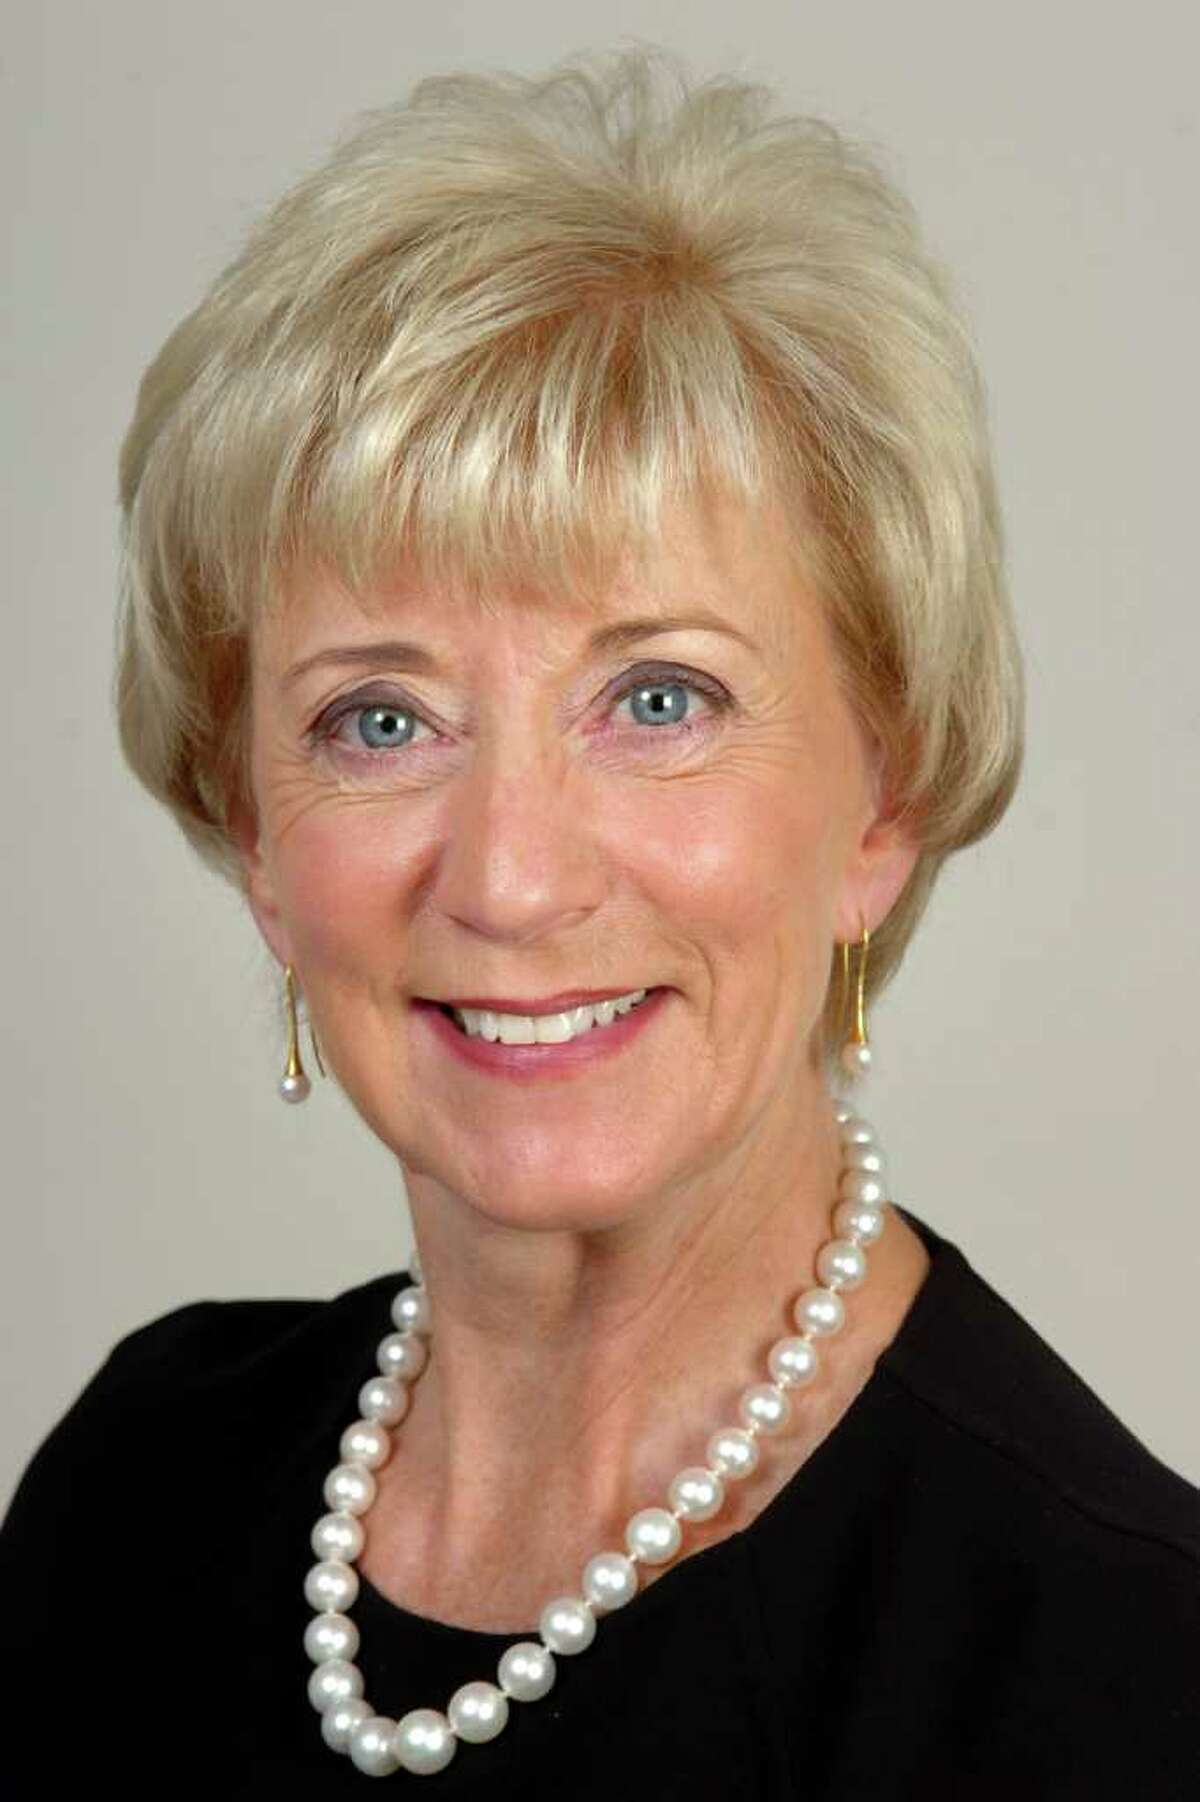 Linda McMahon, Republican candidate for U.S. Senate